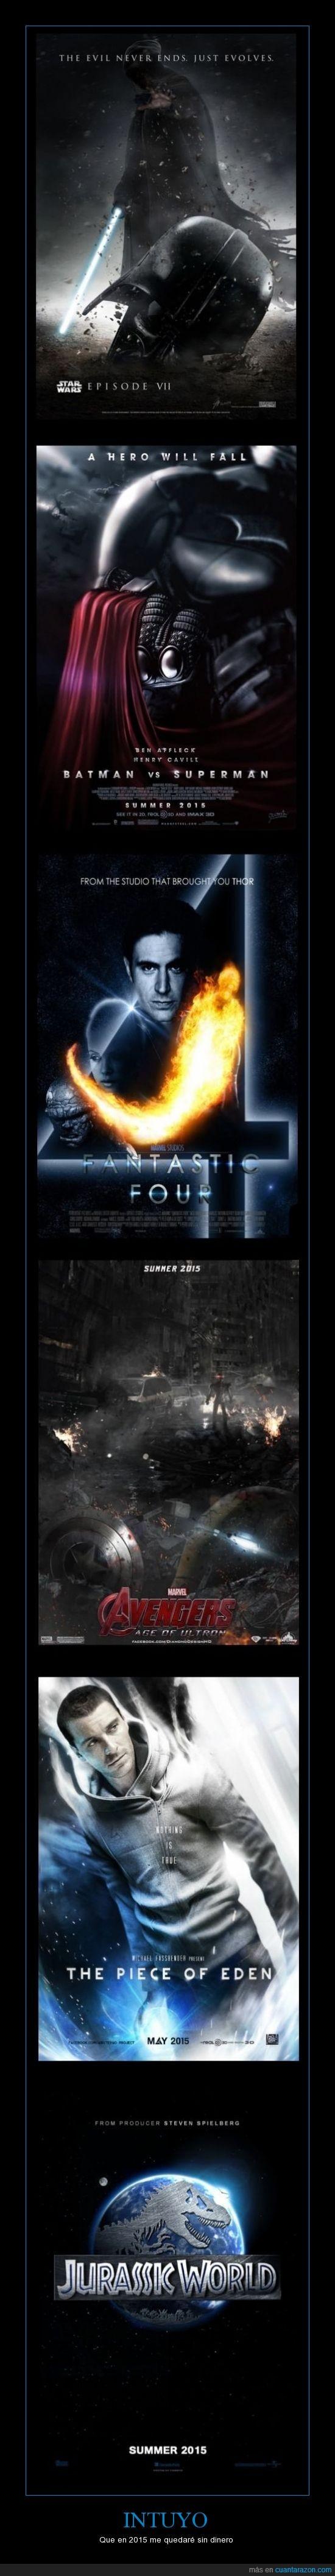 assassins creed,cine,fanart,fantastic 4,jurassic world,peliculas,star wars 7,superman vs batman,the avangers 2